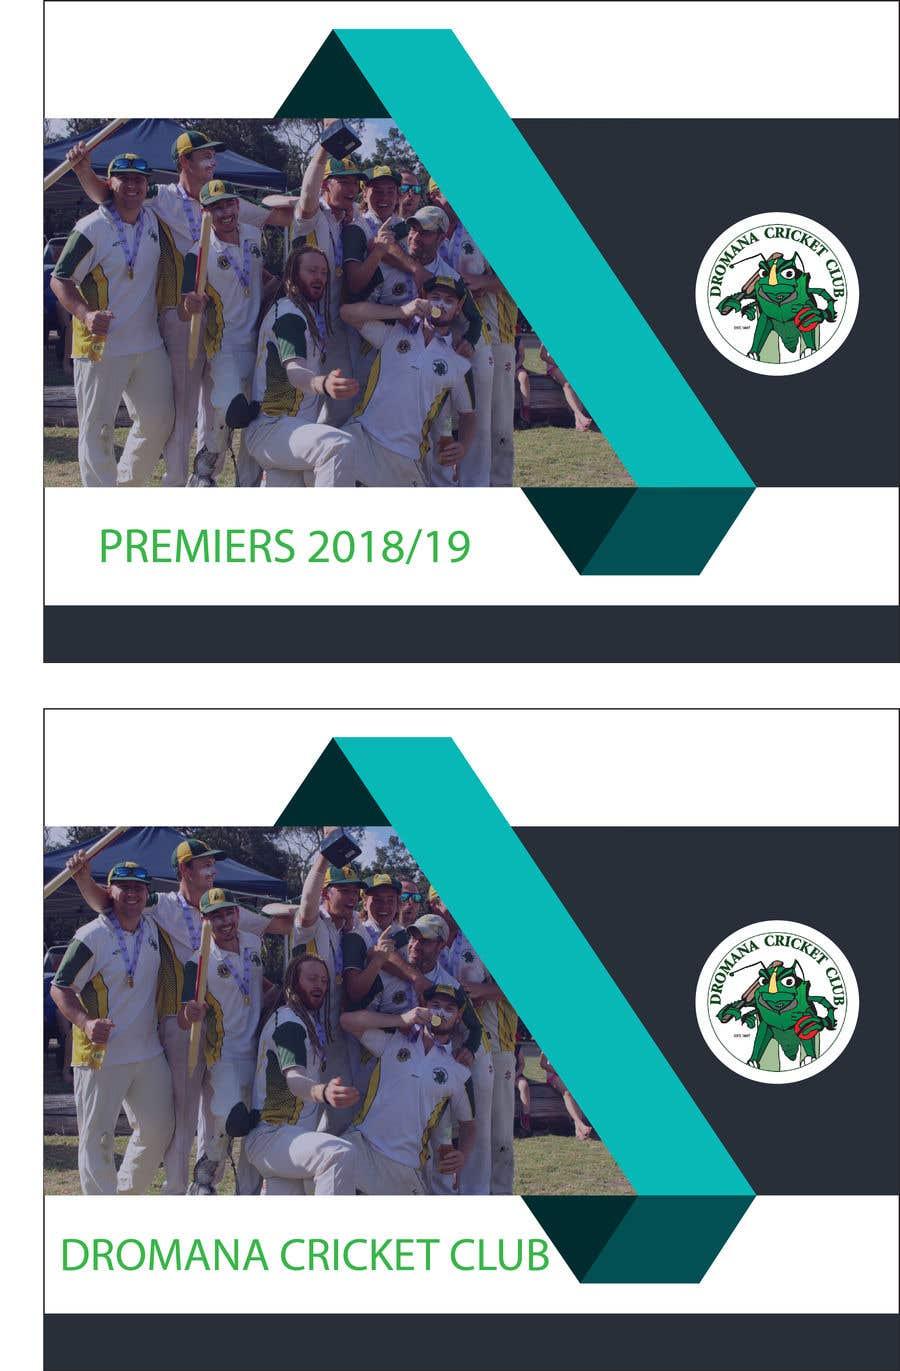 Konkurrenceindlæg #7 for Graphic Art - Cricket Club Flyer